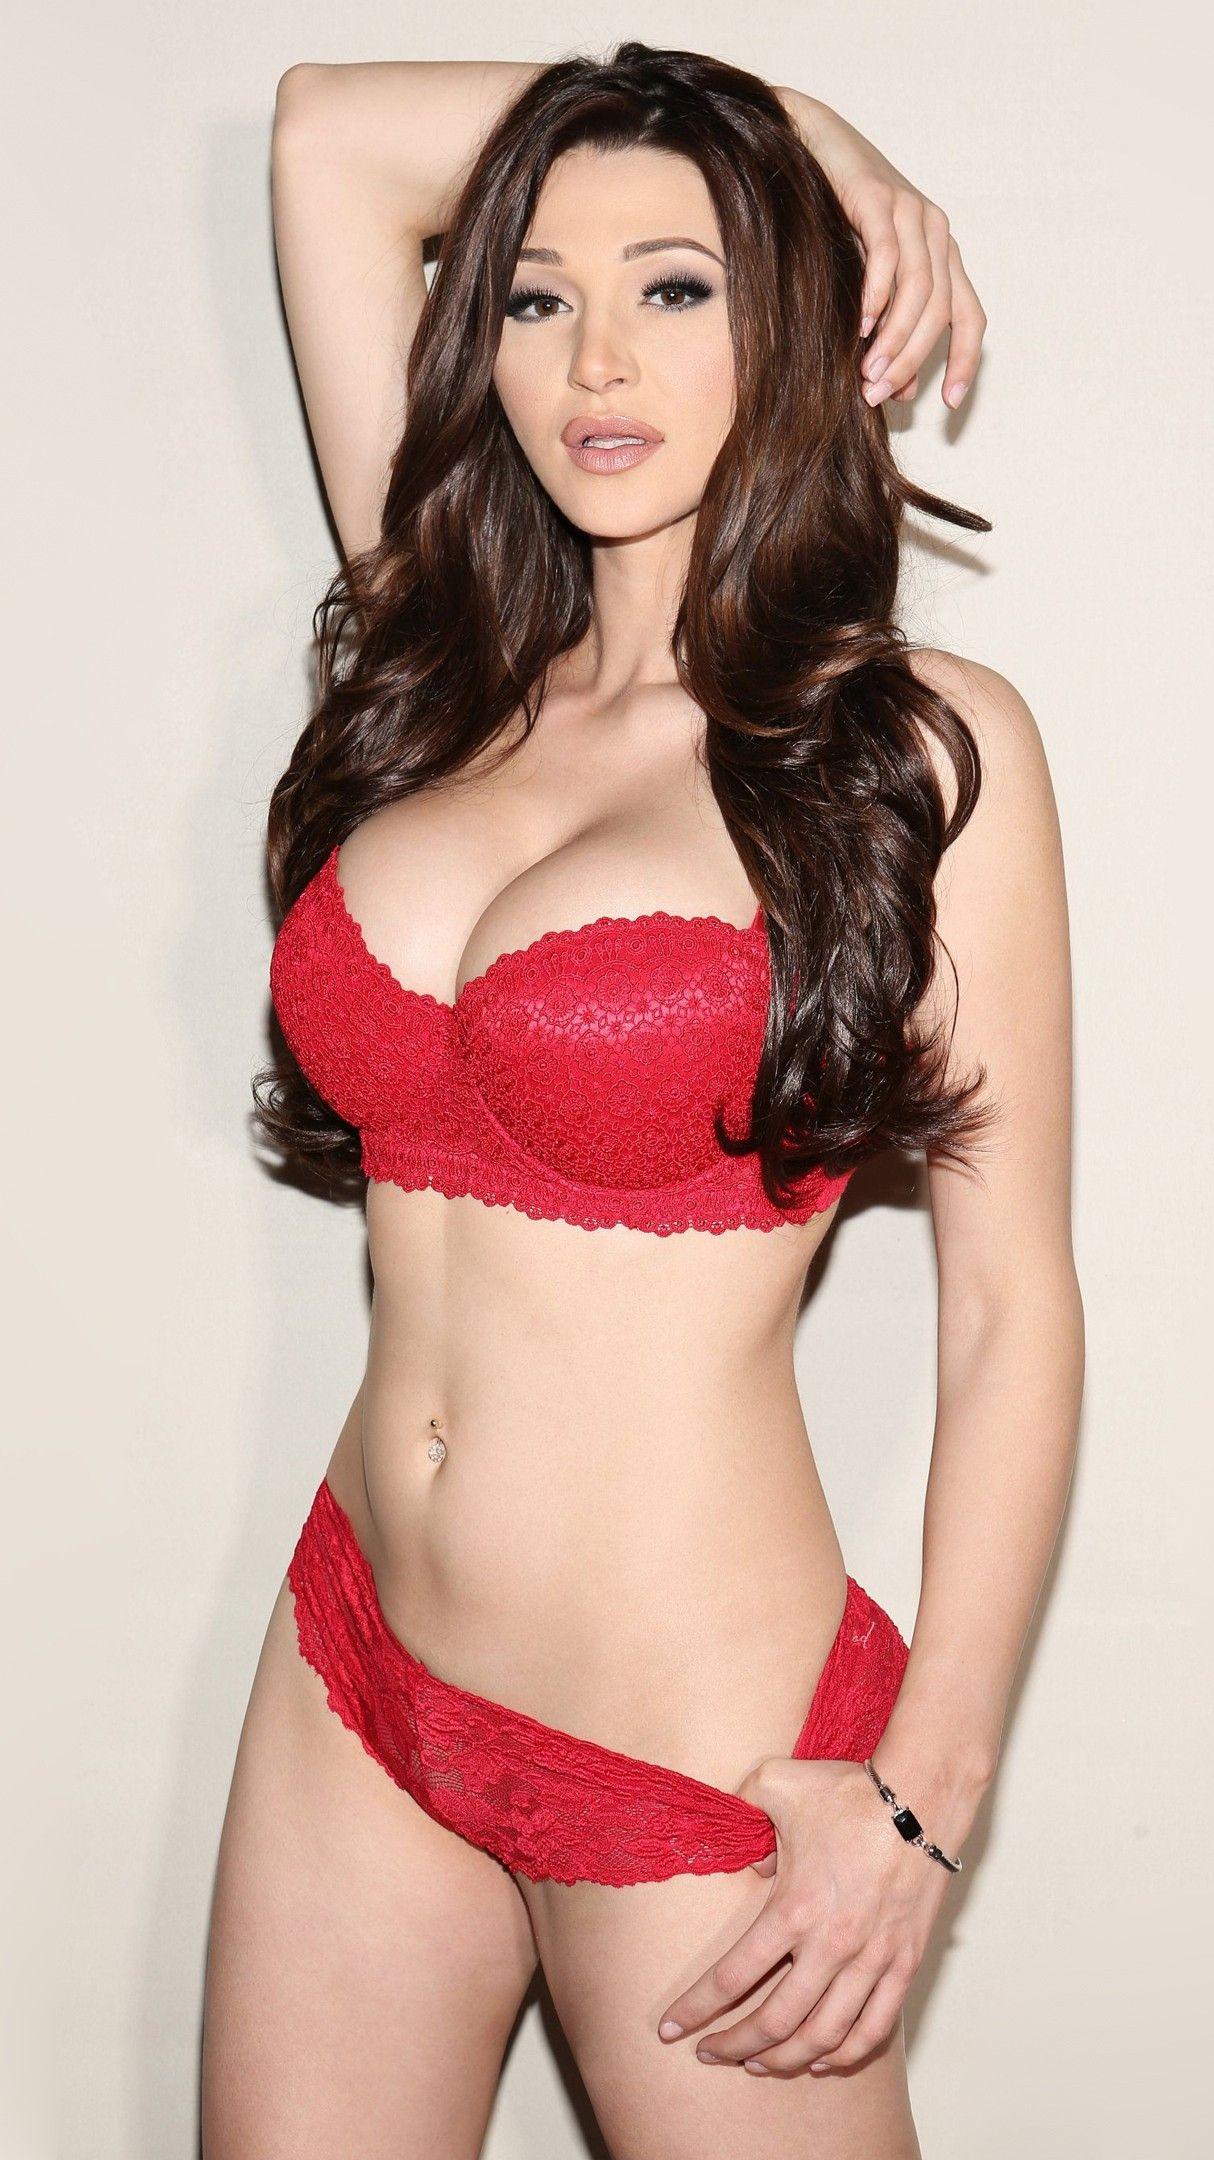 jenna-jenovich-hot-red-bikini-girl-beautiful-iphone-wallpaper